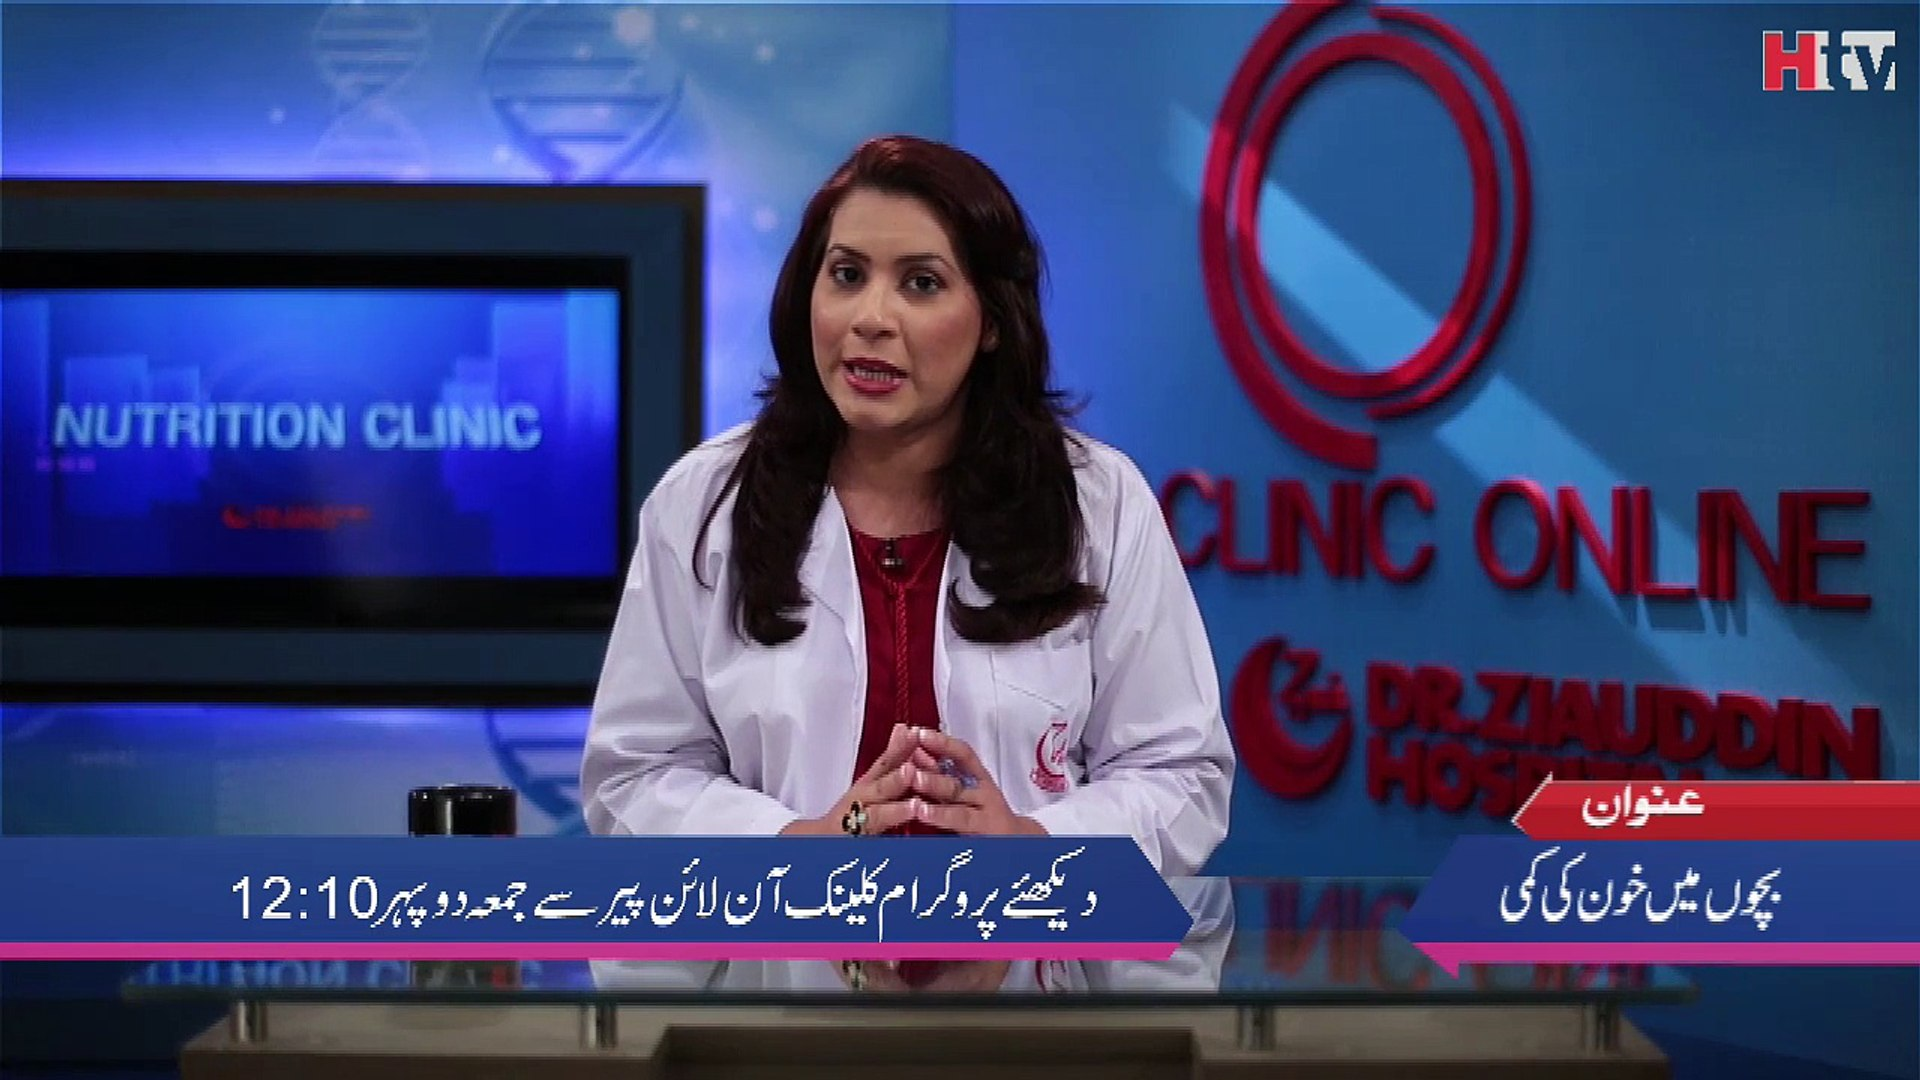 Bachon Main Khoon Ki Kami Ka Ilaj -Clinic Online -HTV